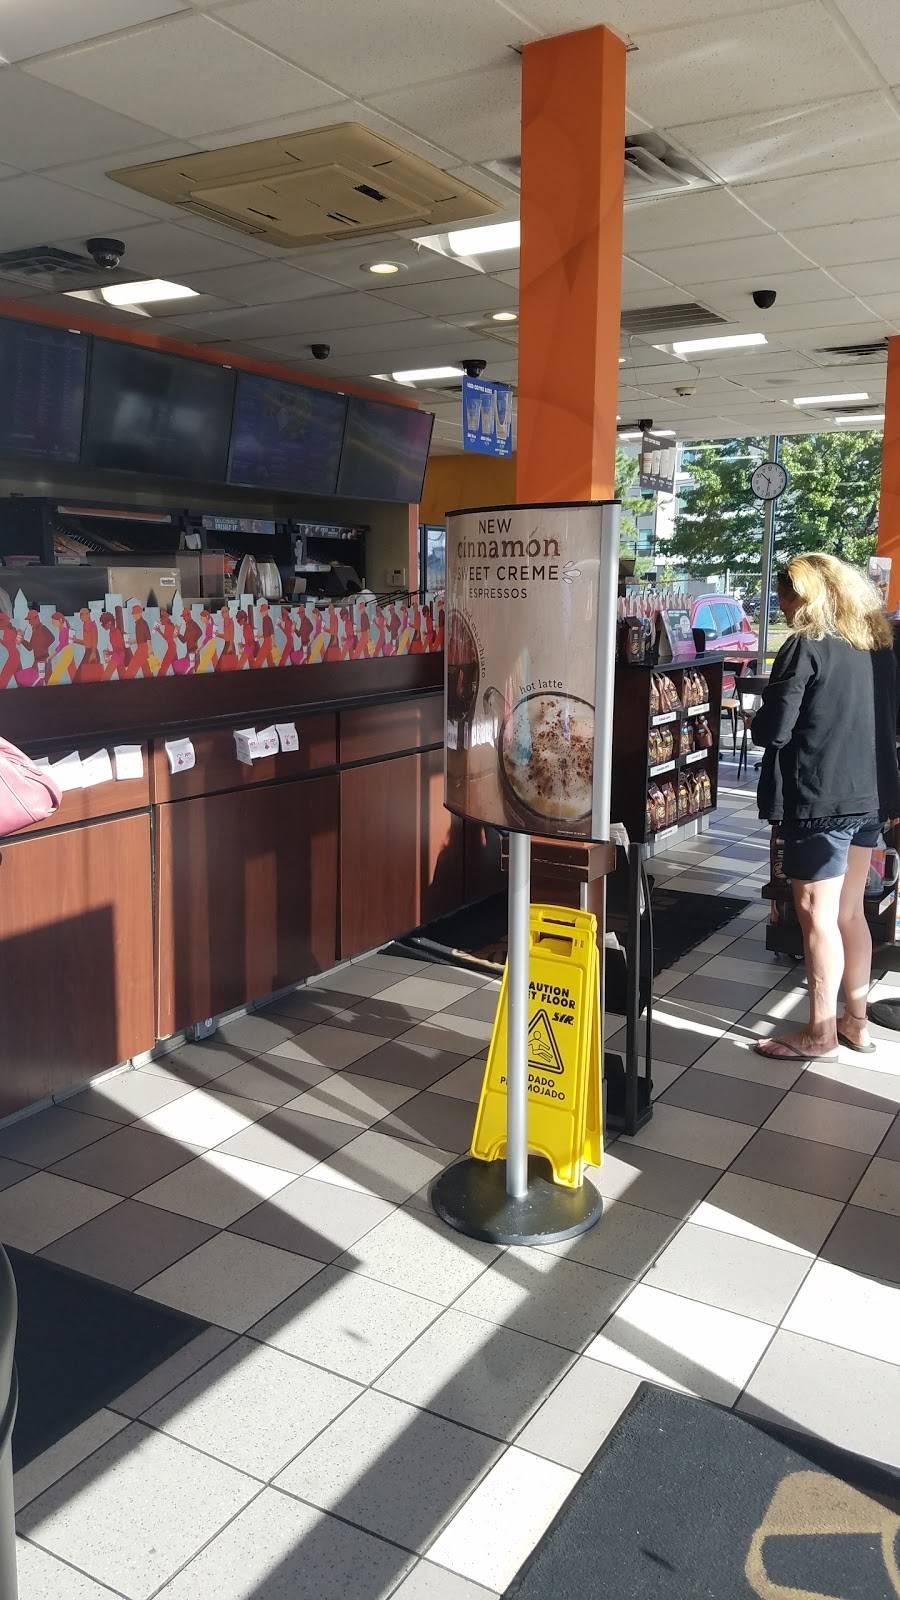 Dunkin Donuts | cafe | 343 NJ-17, Hasbrouck Heights, NJ 07604, USA | 2012889639 OR +1 201-288-9639